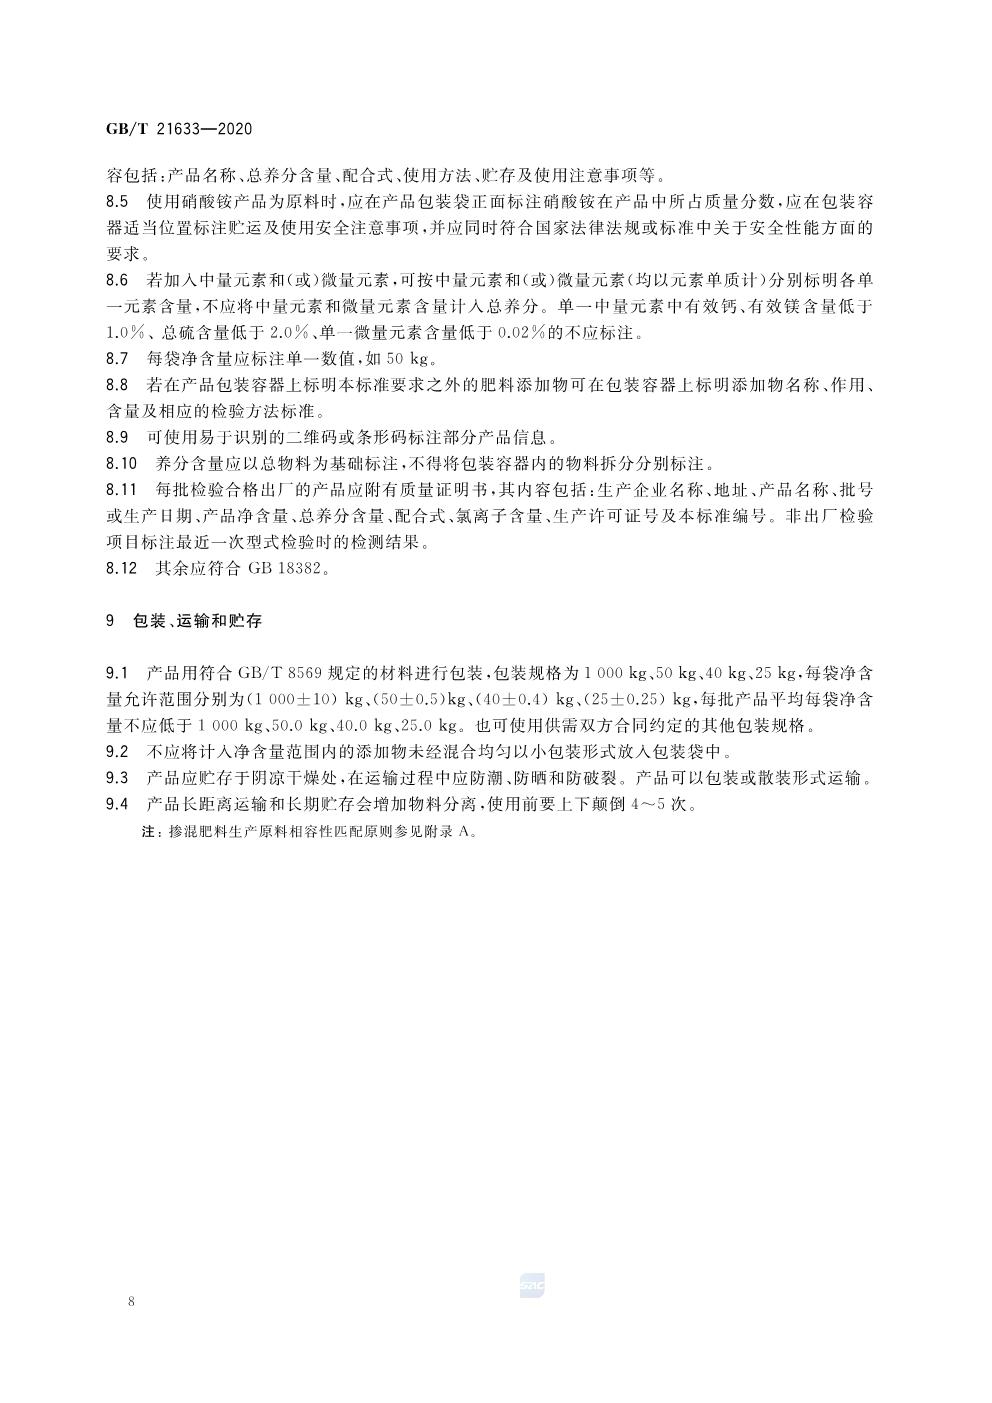 GBT21633-2020掺混肥料